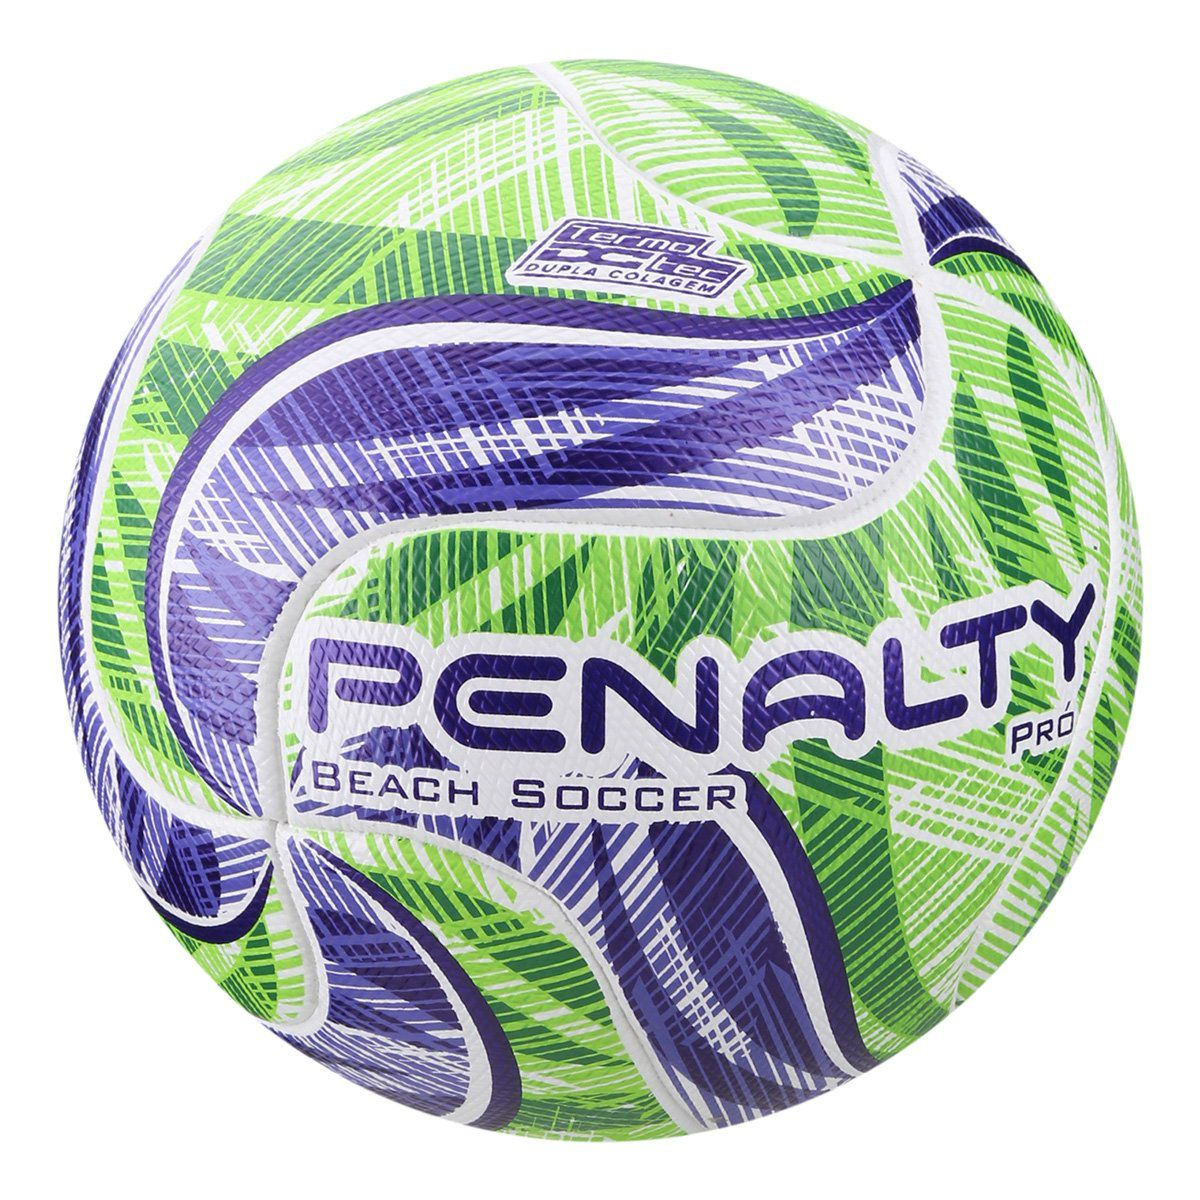 Bola de Futebol de Areia Penalty Beach Soccer Pró IX